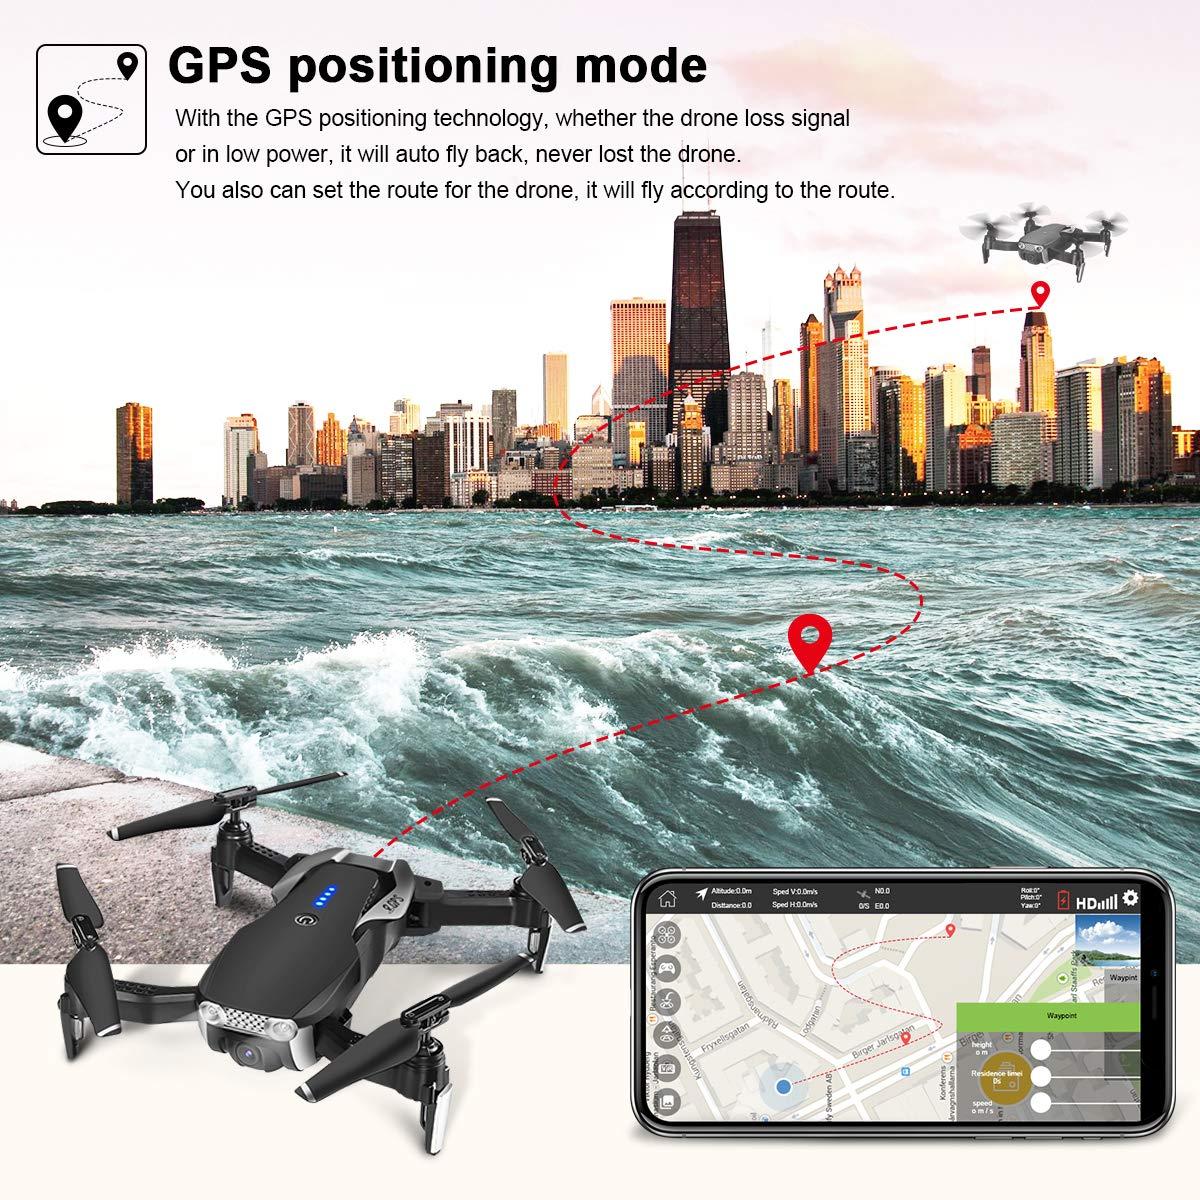 EACHINE E511S GPS Positioning mode